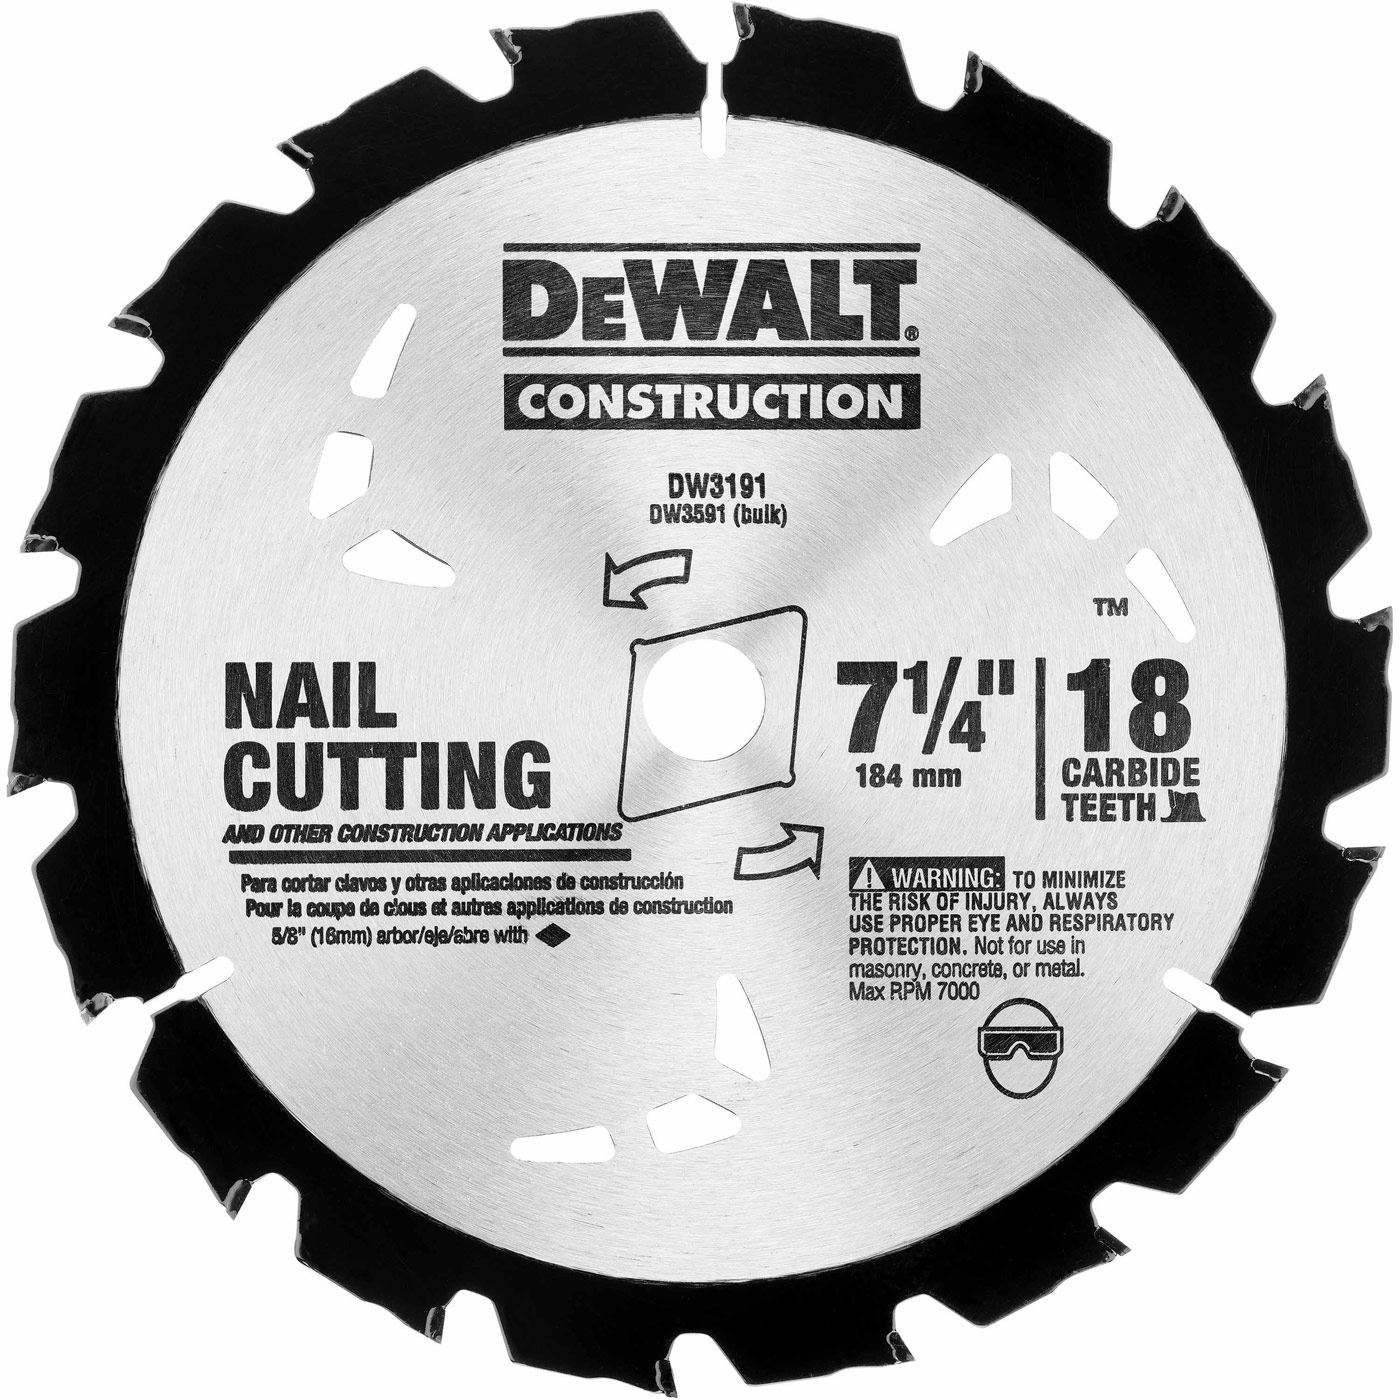 Tool accessories circular saw blades dewalt dw3191 series 20 7 14 18t nail cutting circular saw blade greentooth Choice Image